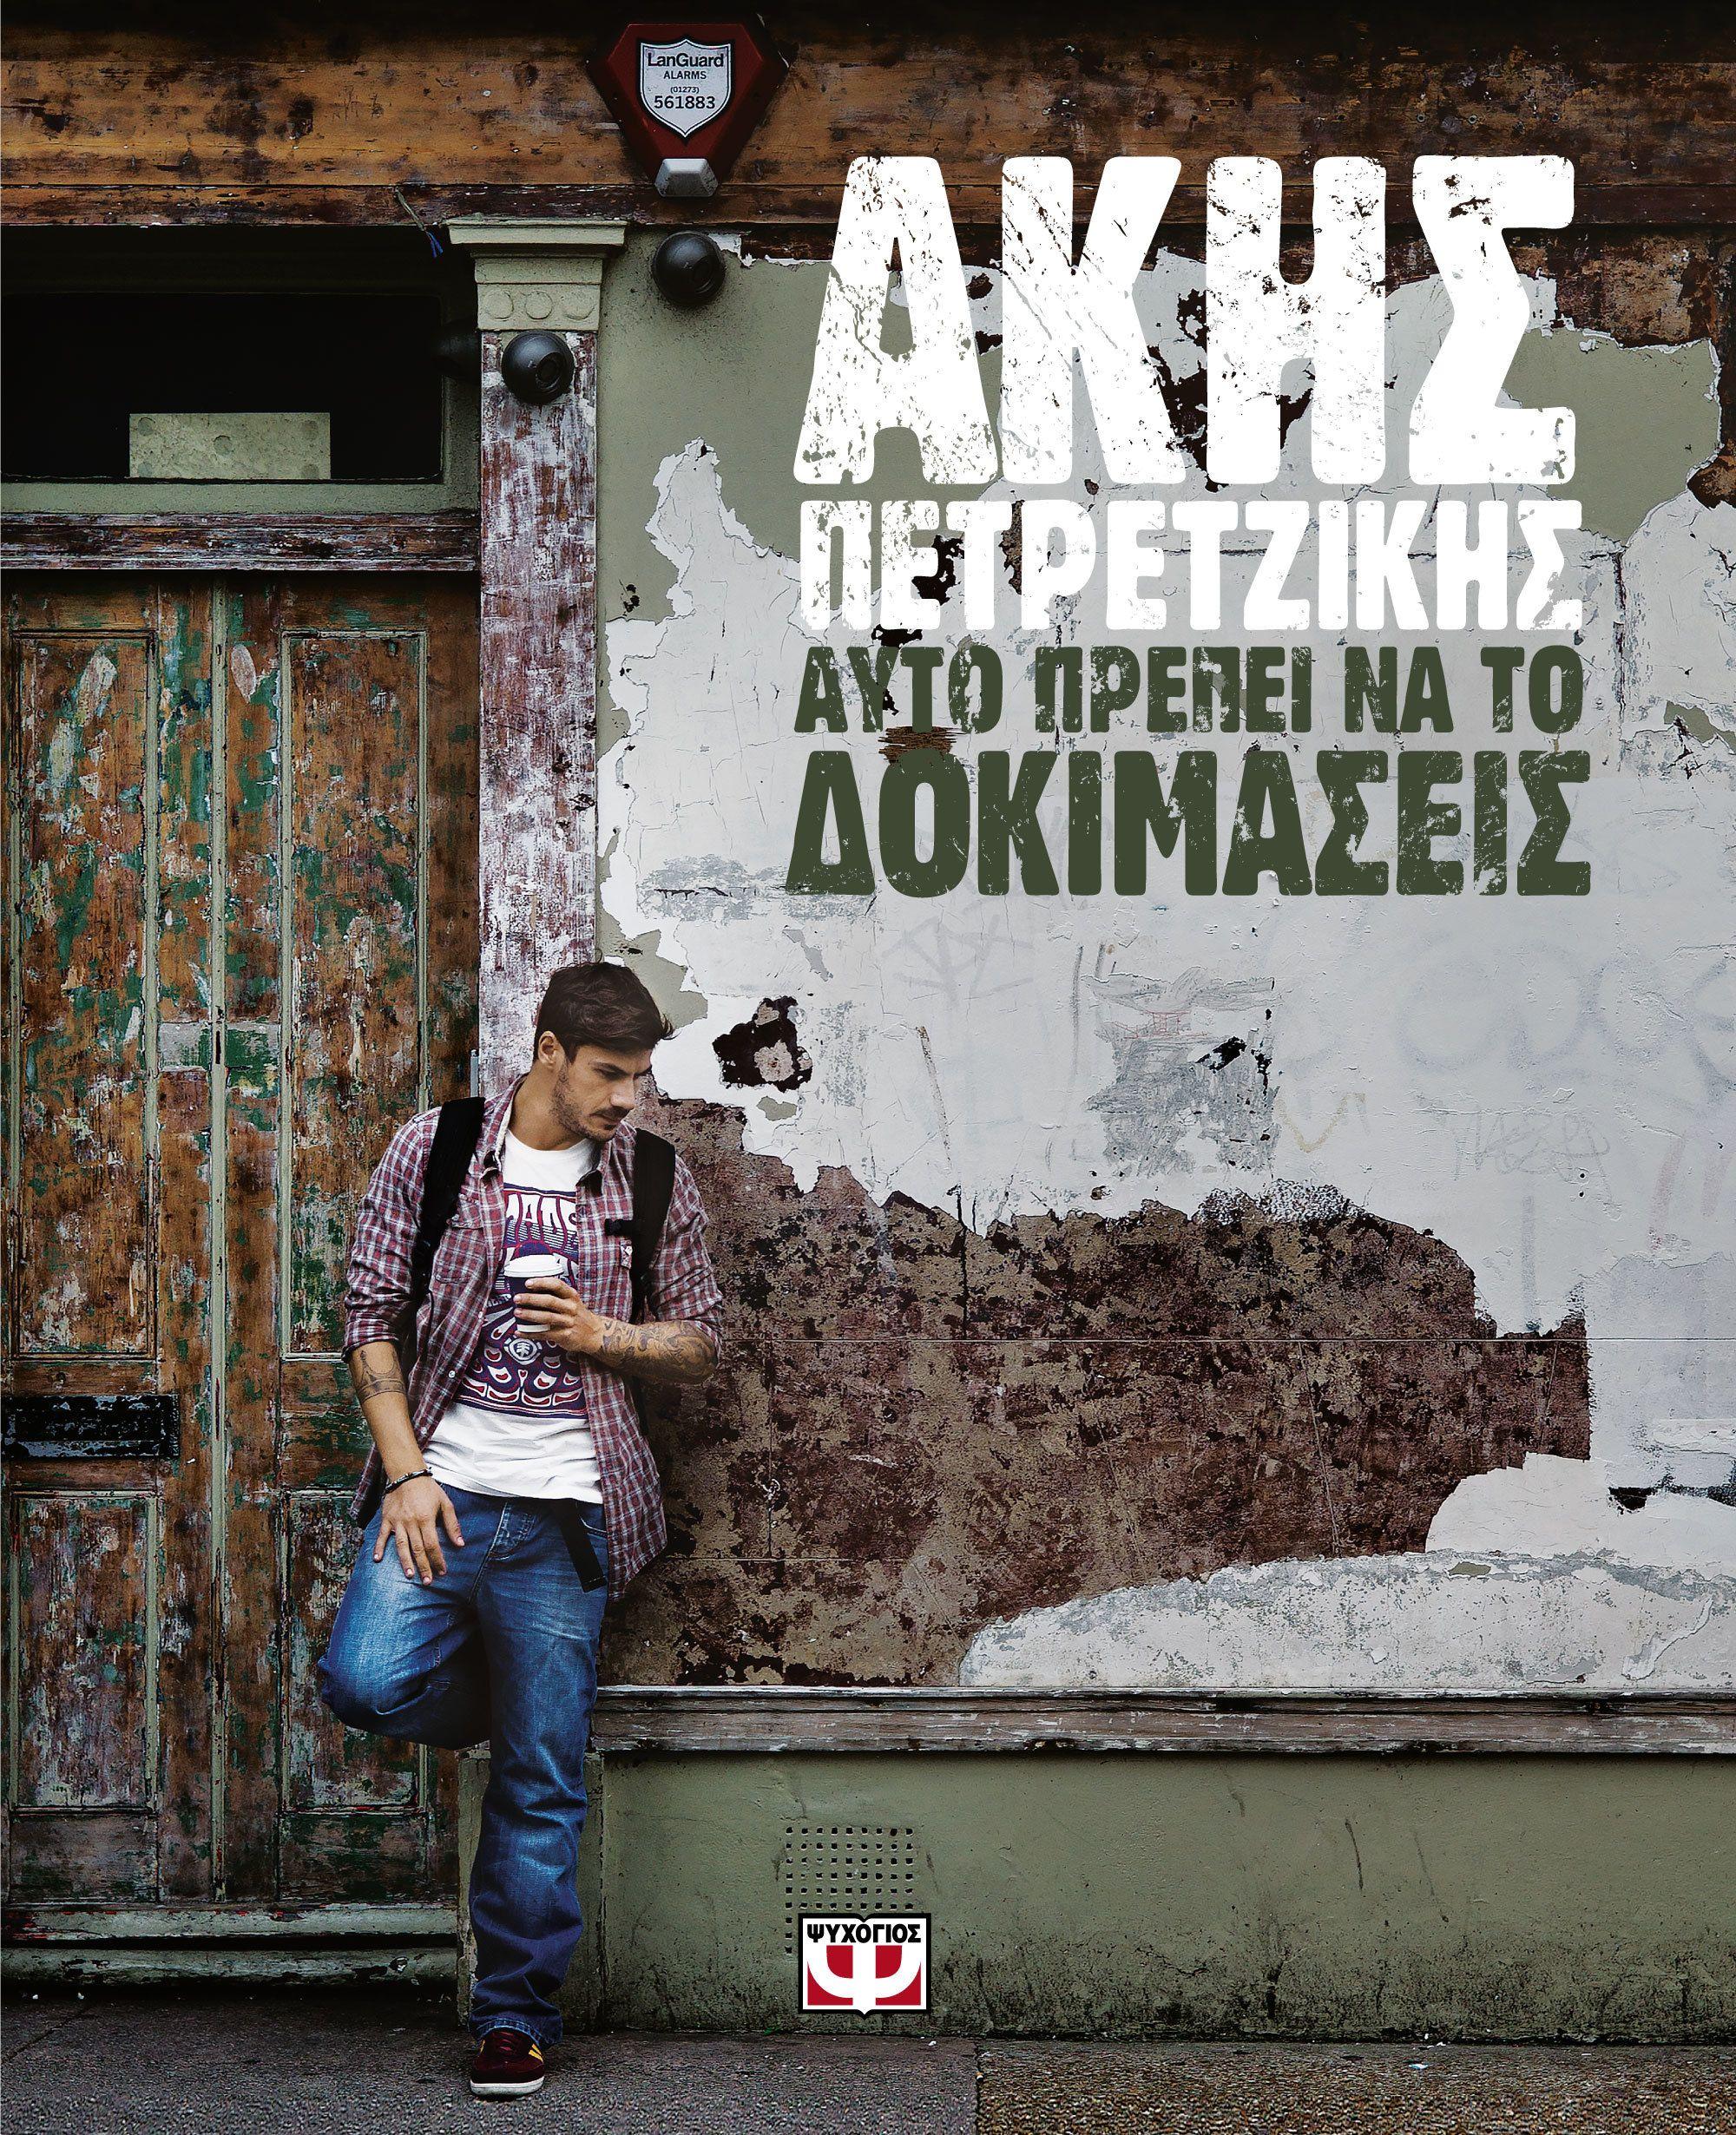 Akis petretzikis cover final